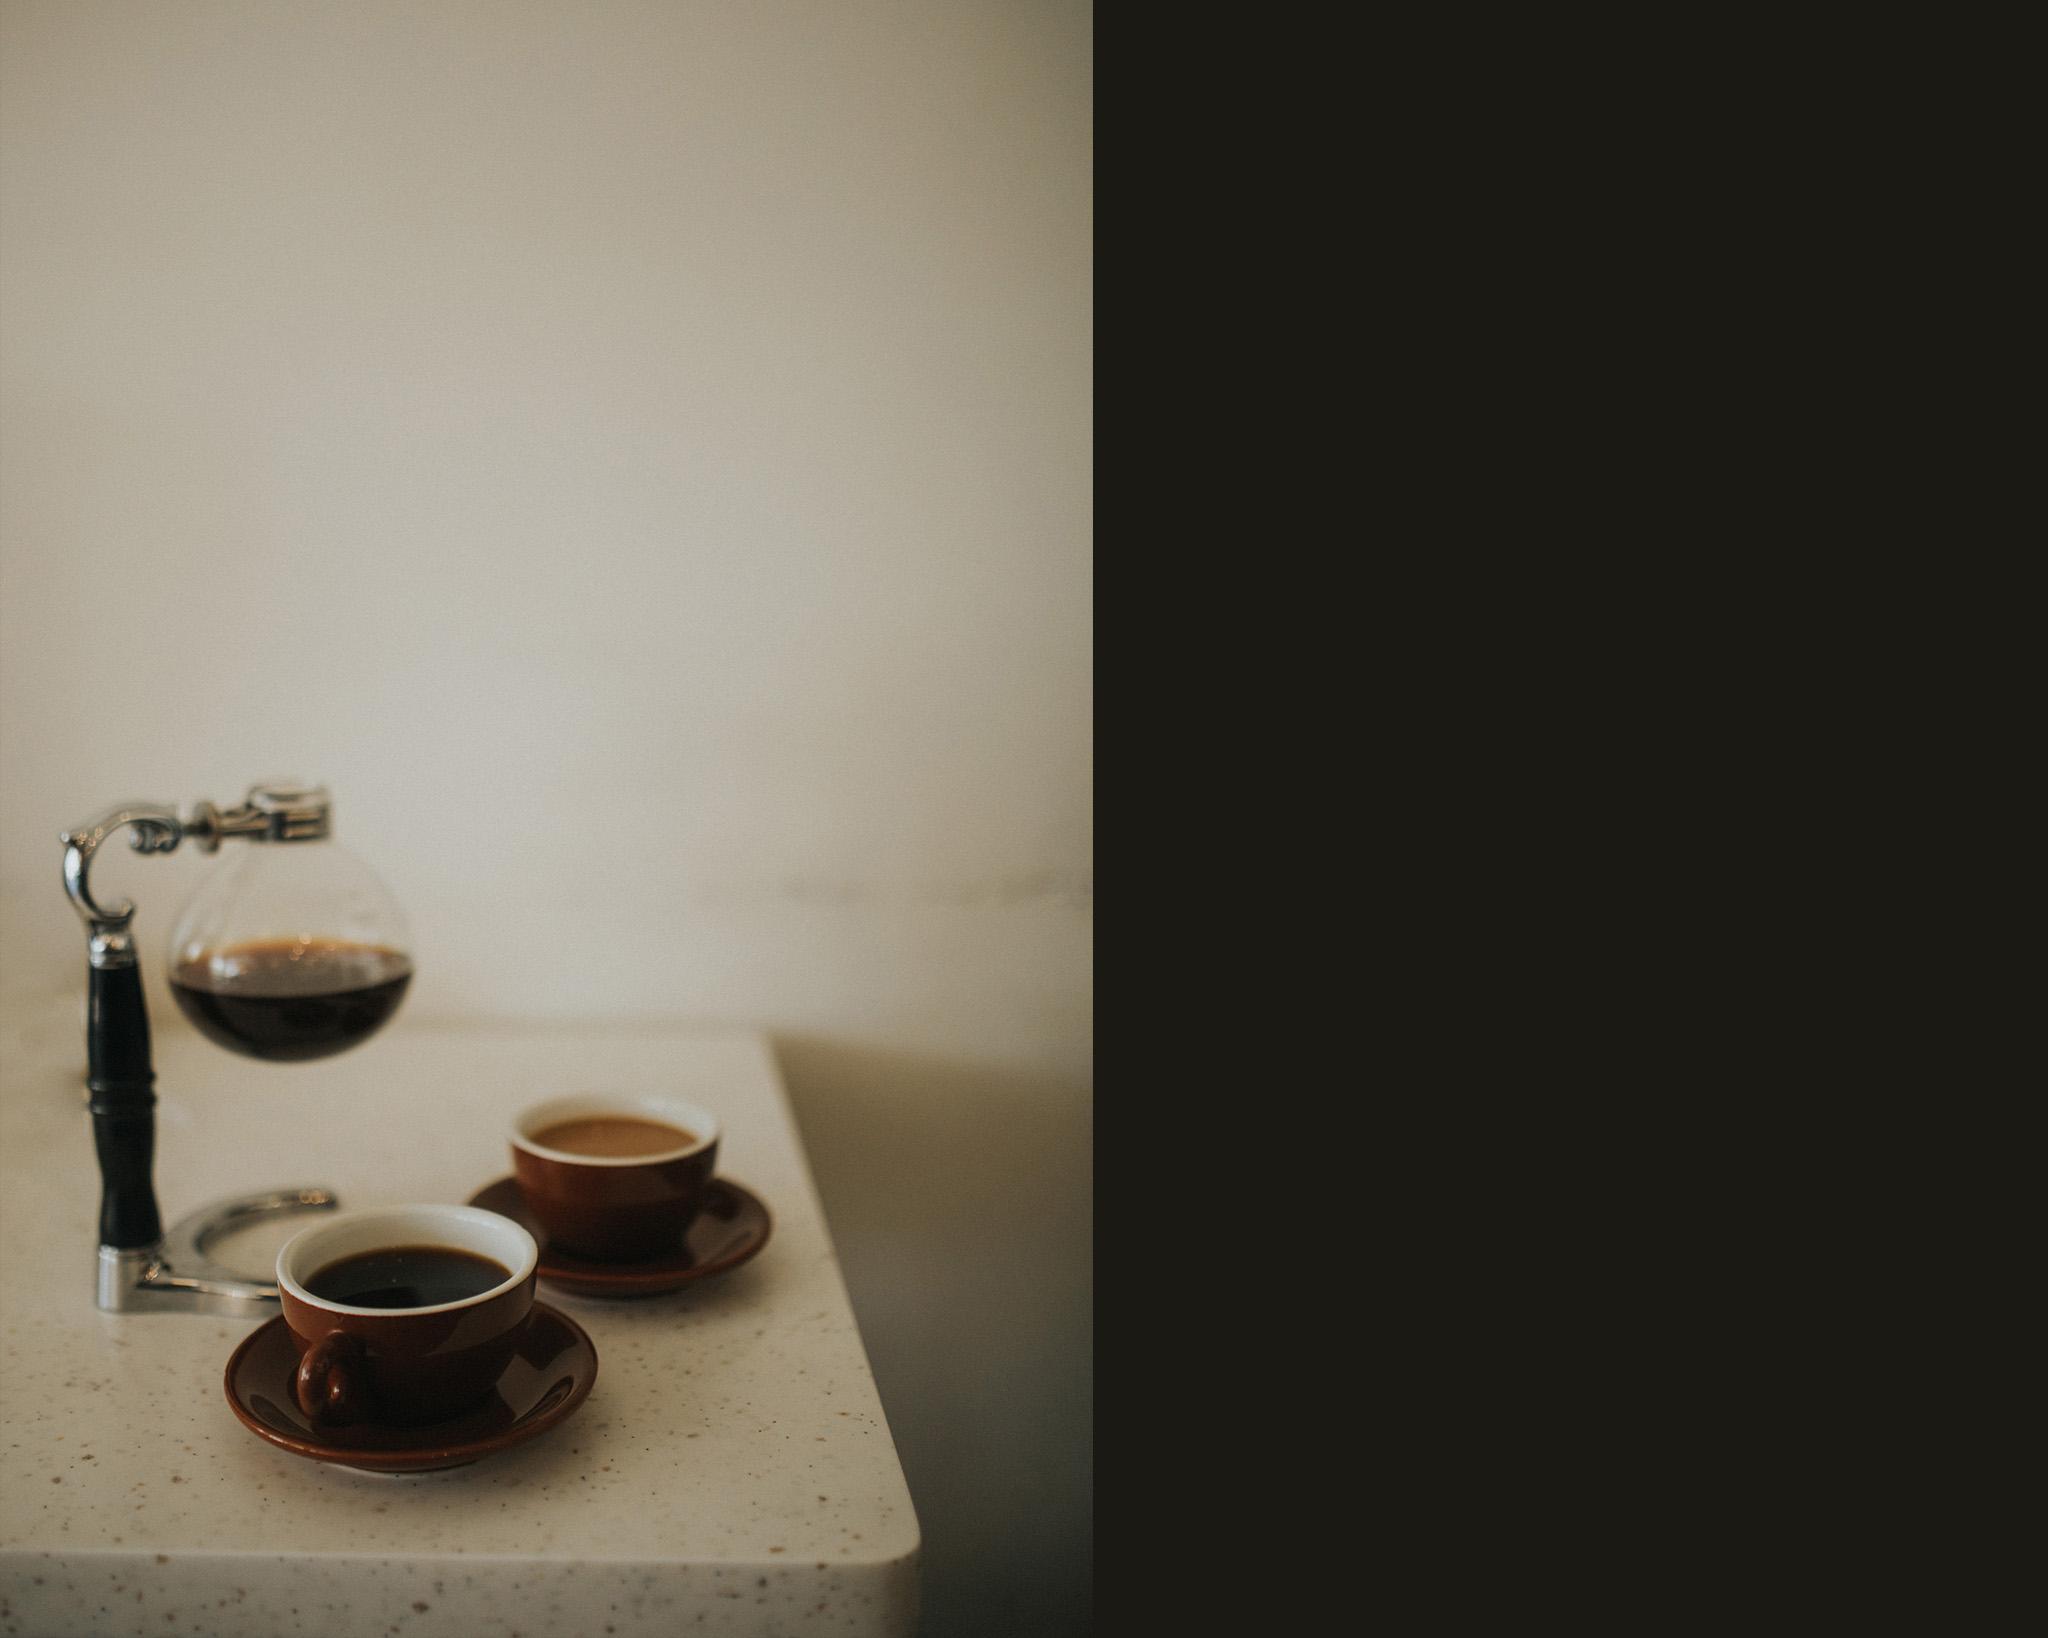 April 23: The neighborhood coffee shop,  J. René,  is something special.